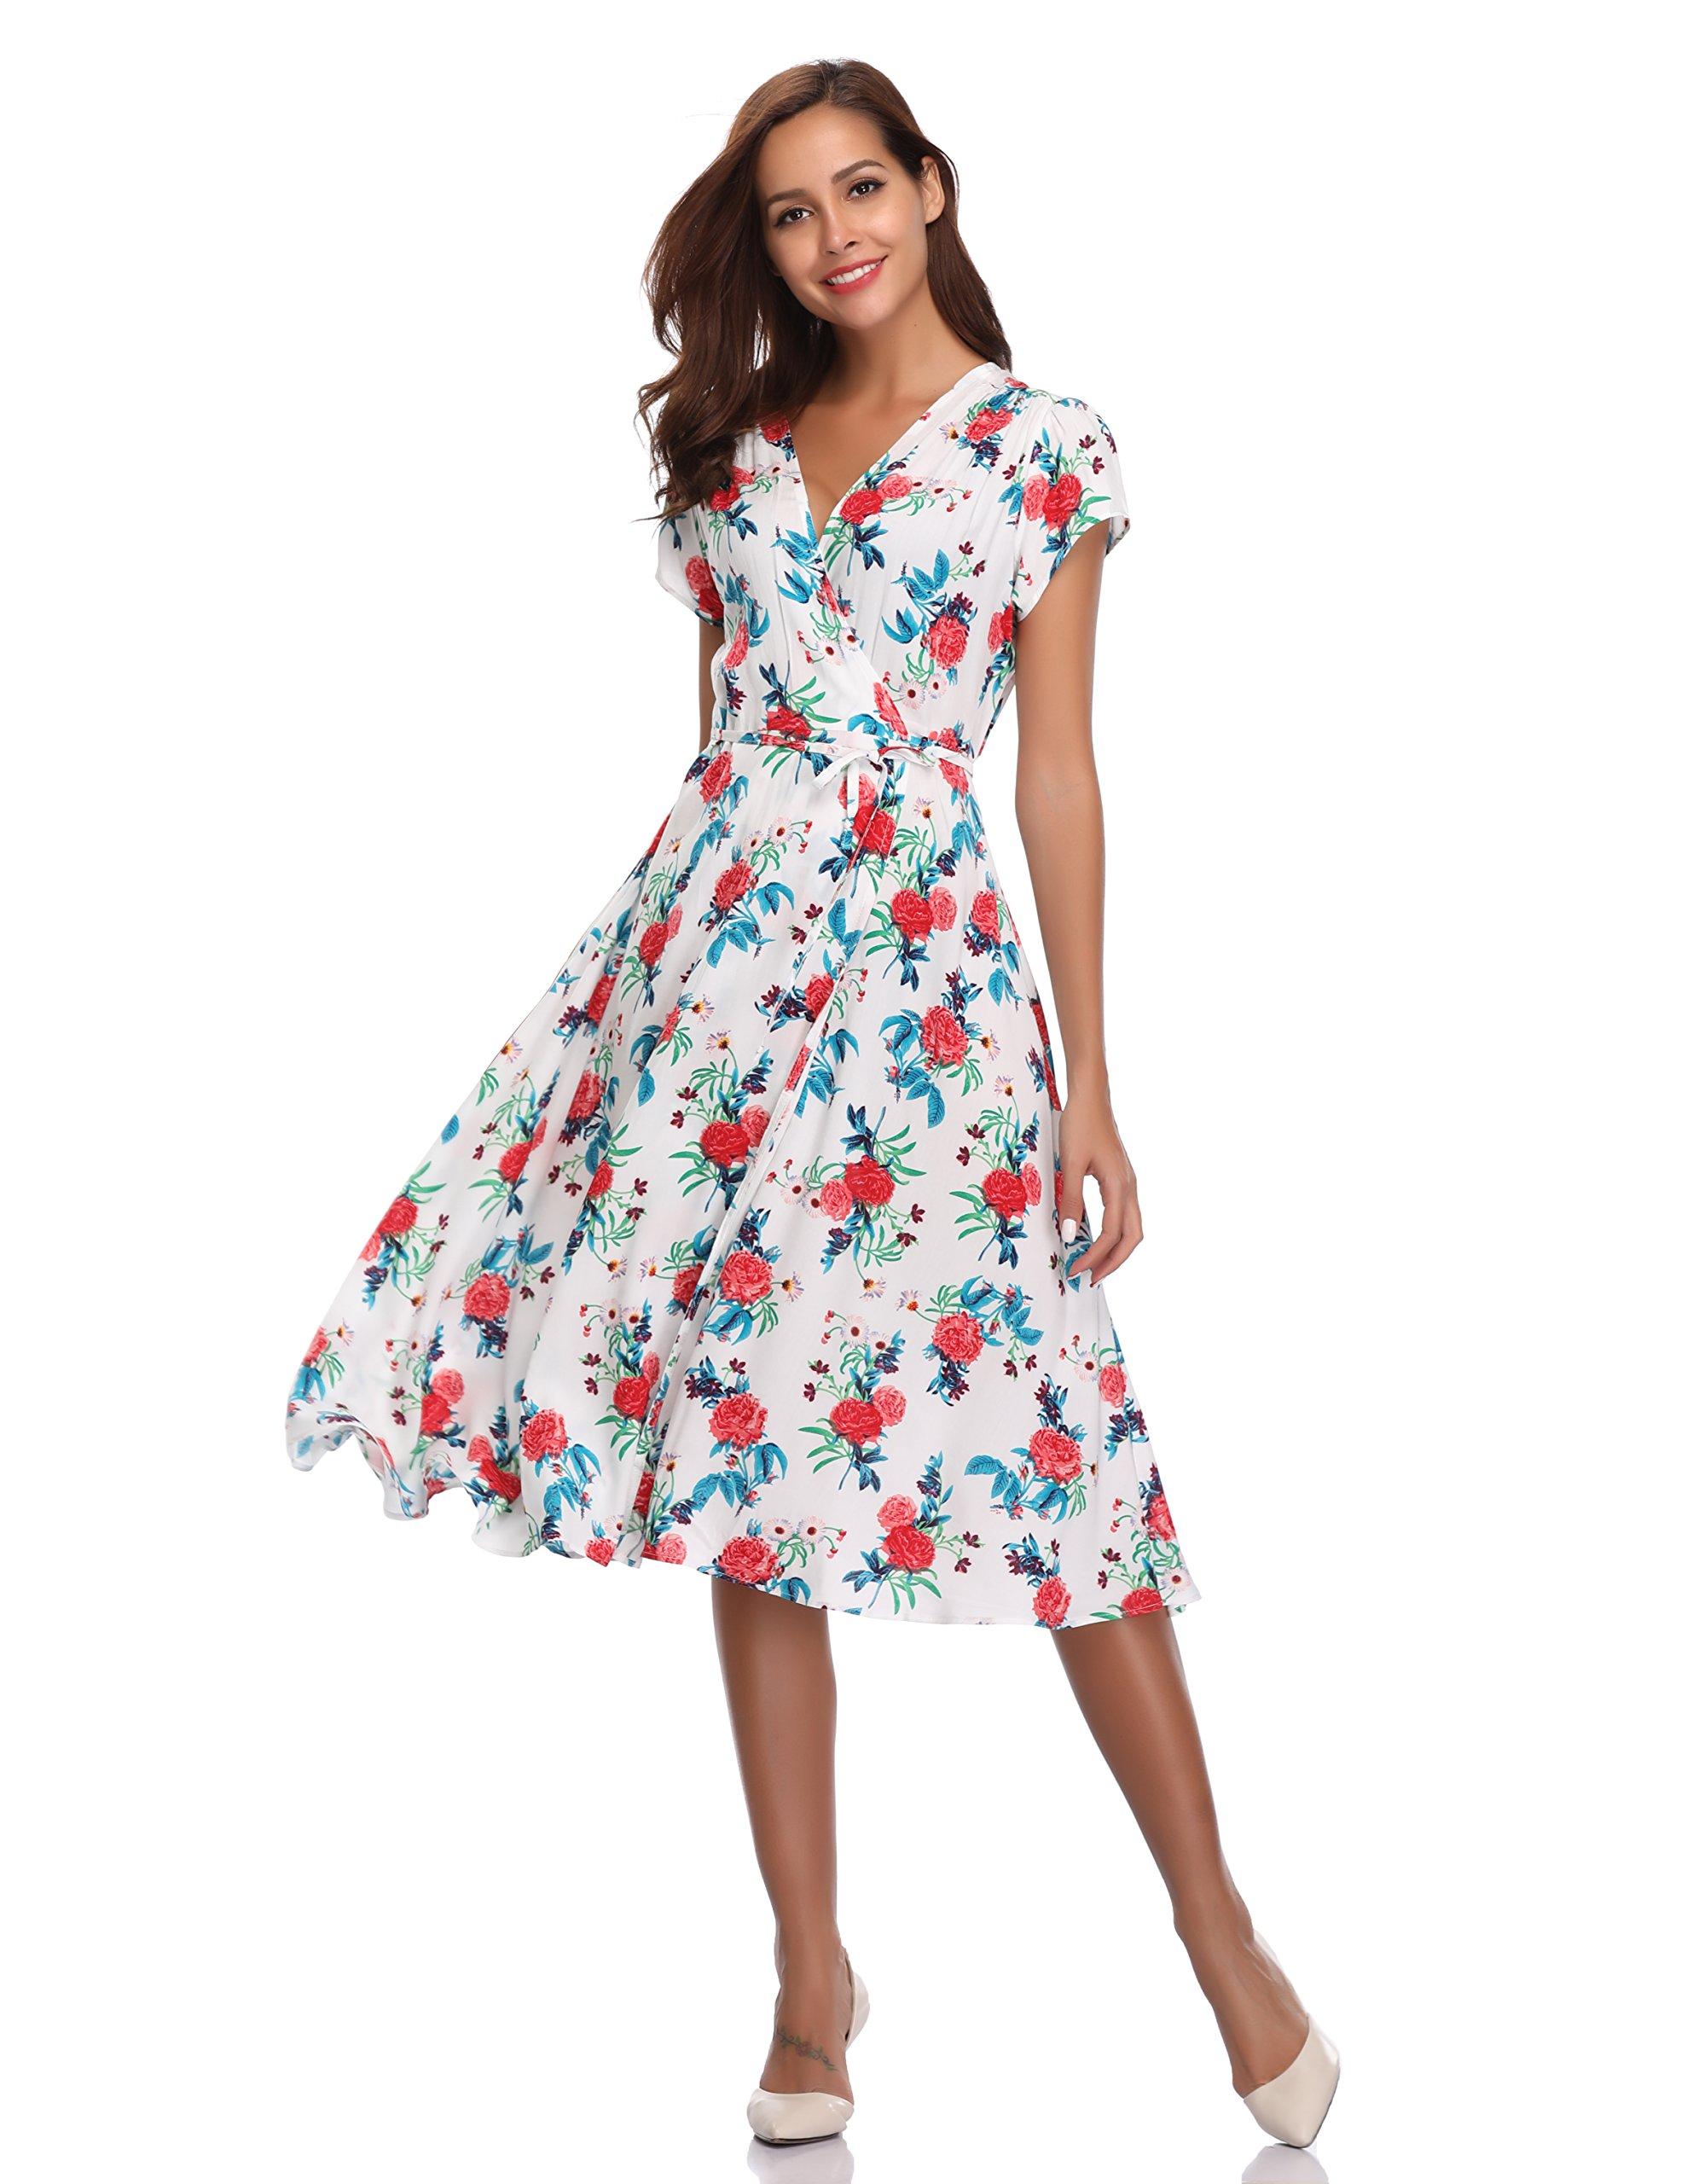 Floating Time Women's Floral Print Short Sleeve Midi Wrap Dress(S, CF42583-3)